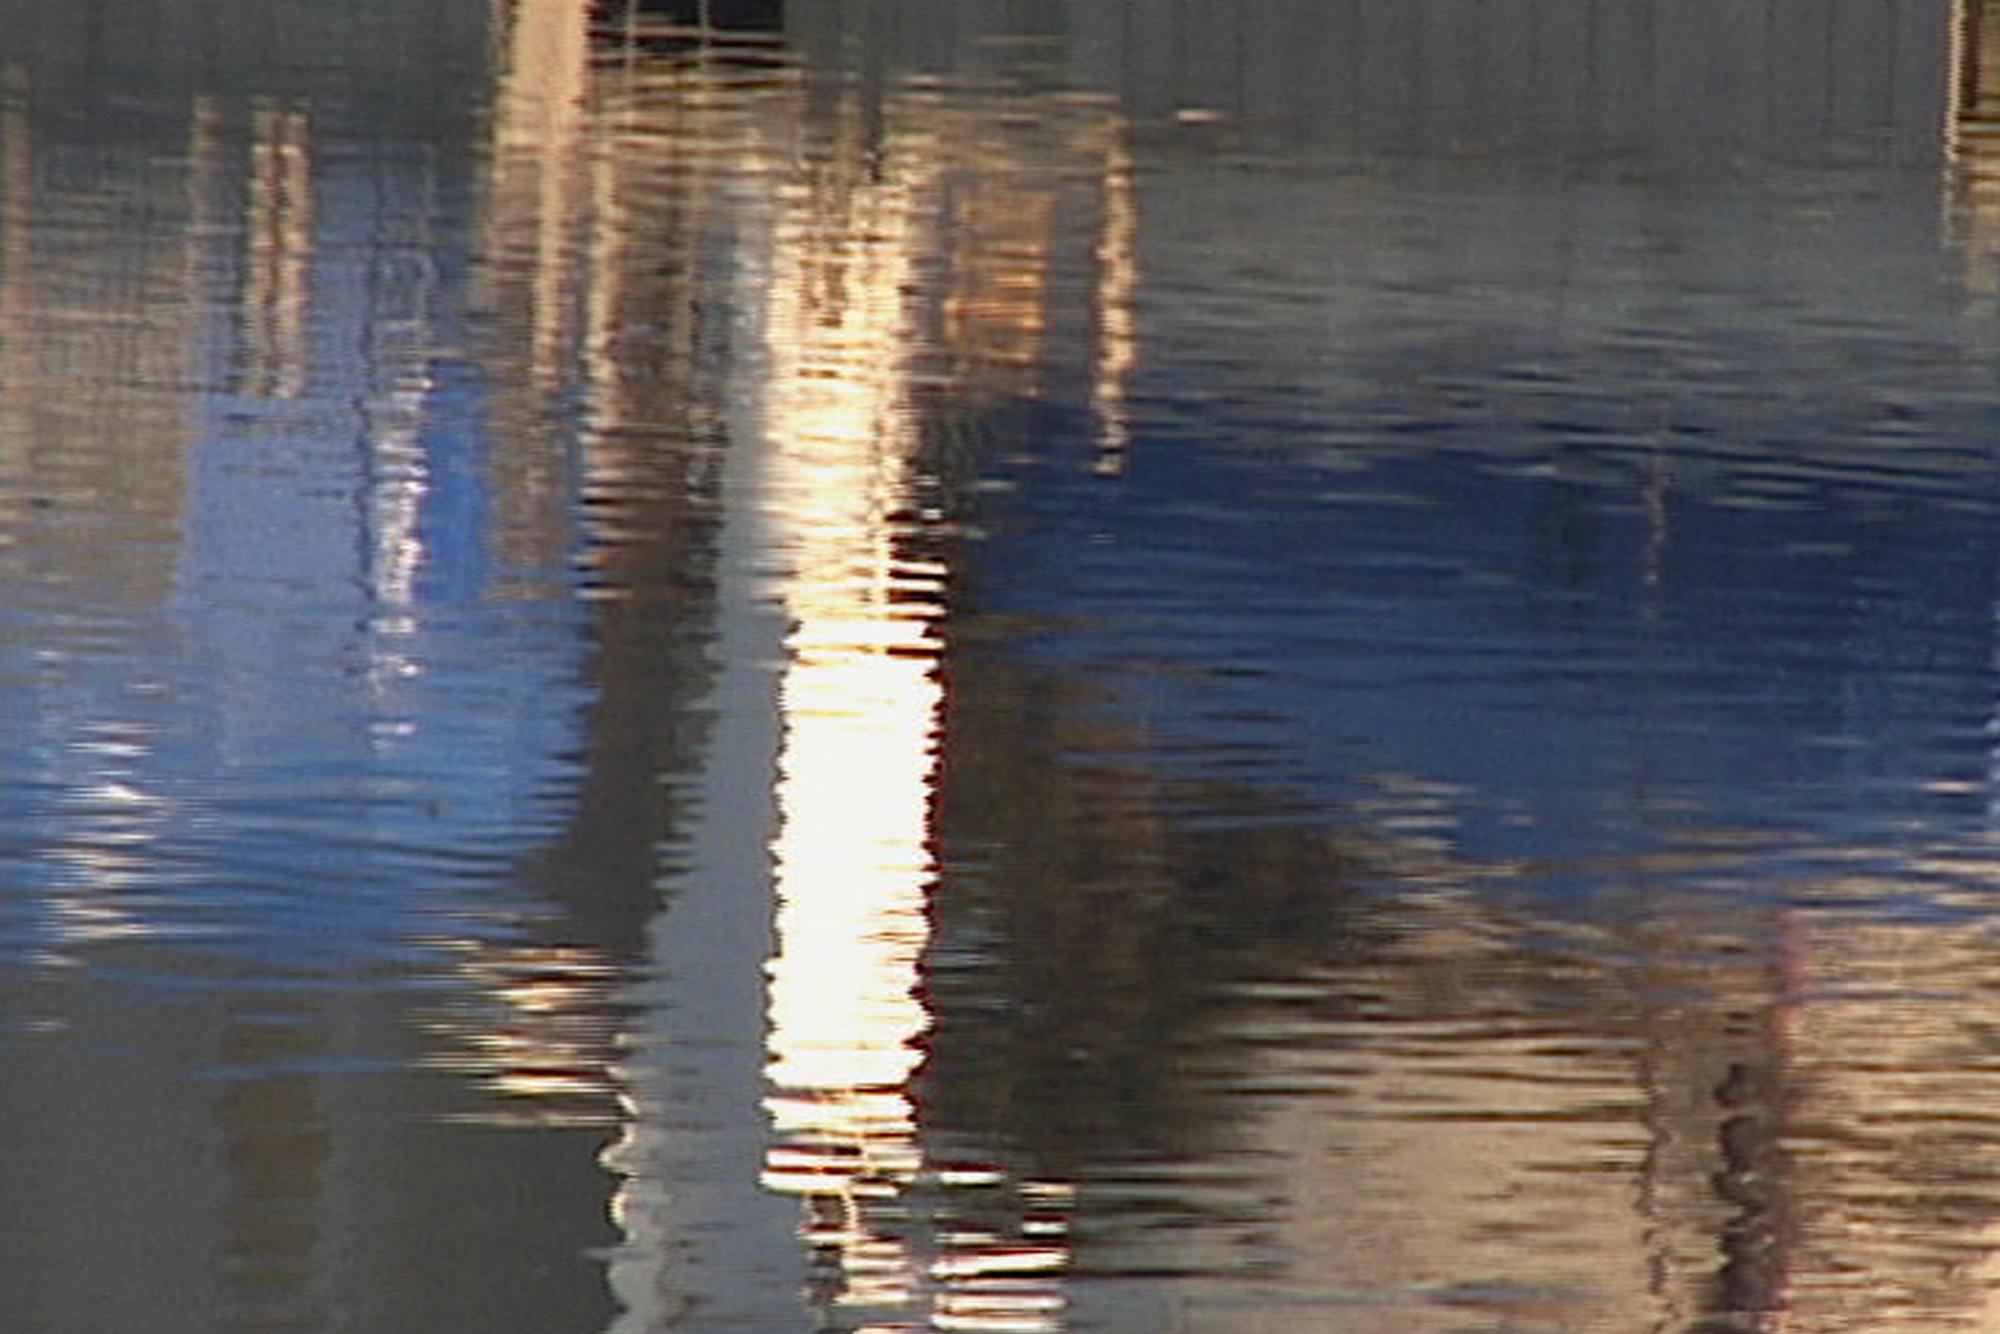 3j_Cuyahoga reflections .jpg